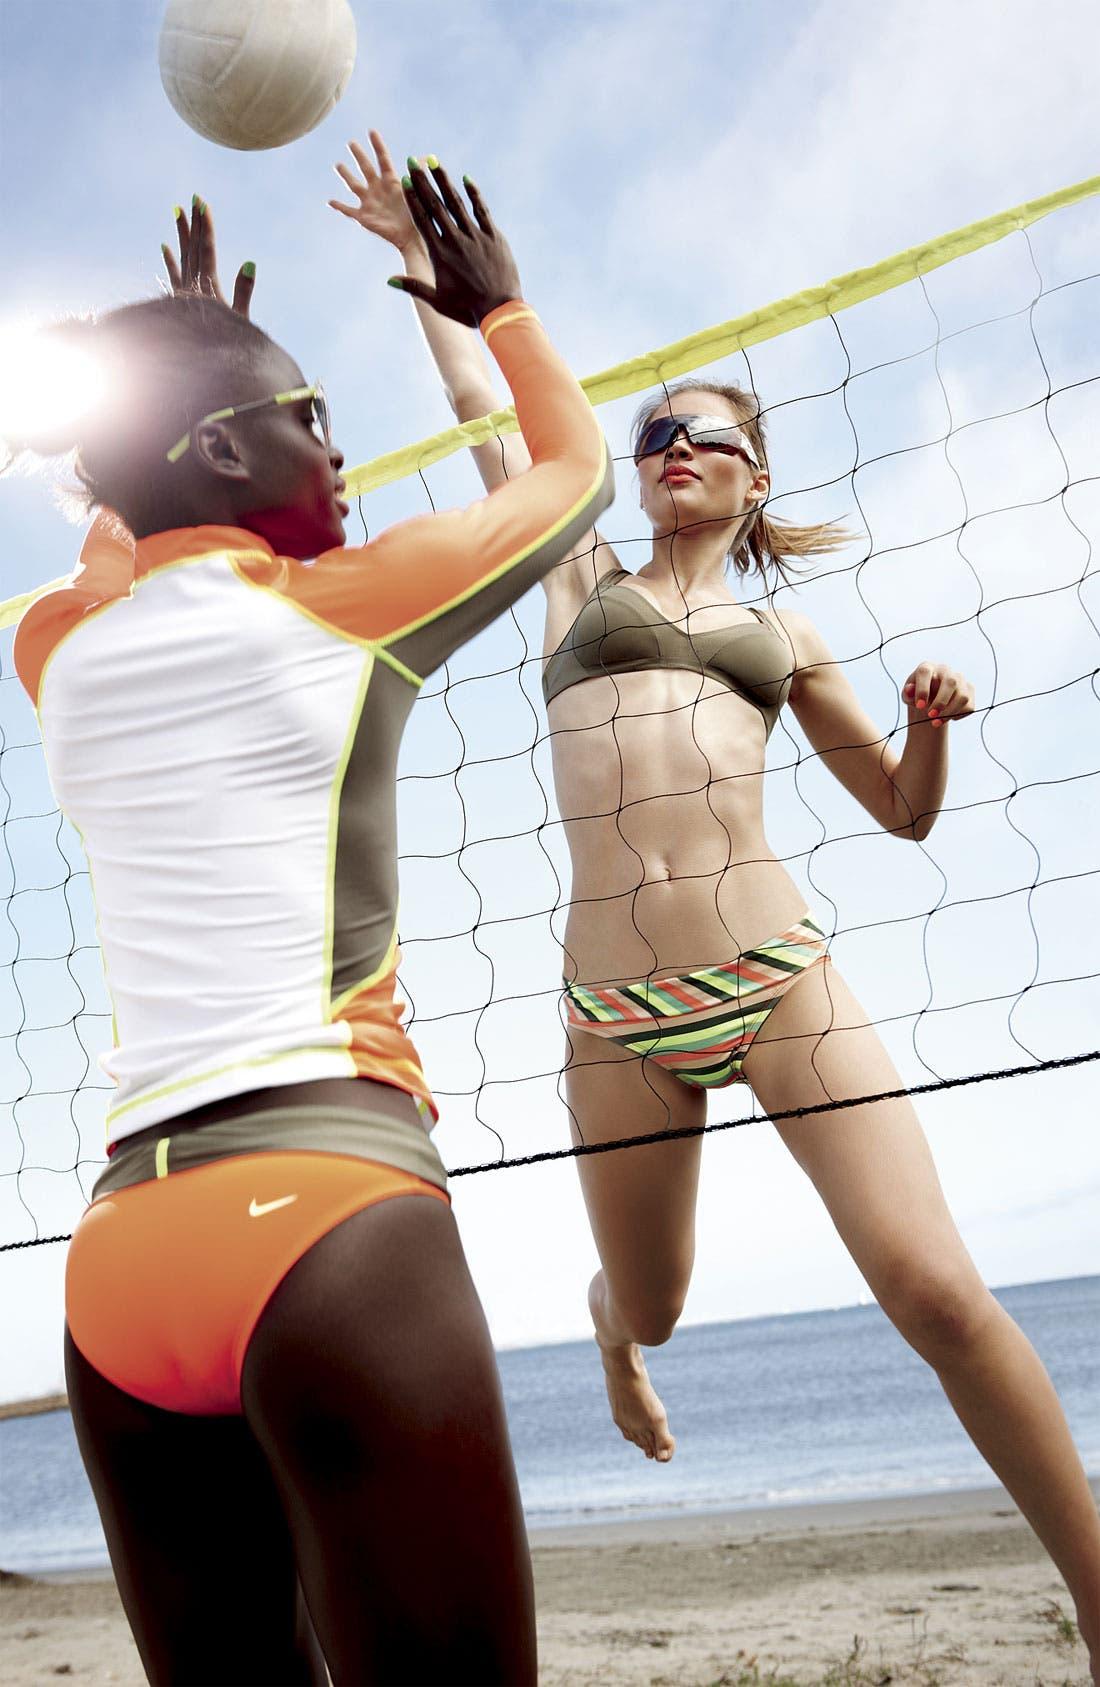 Main Image - Nike Rashguard & Bikini Bottoms